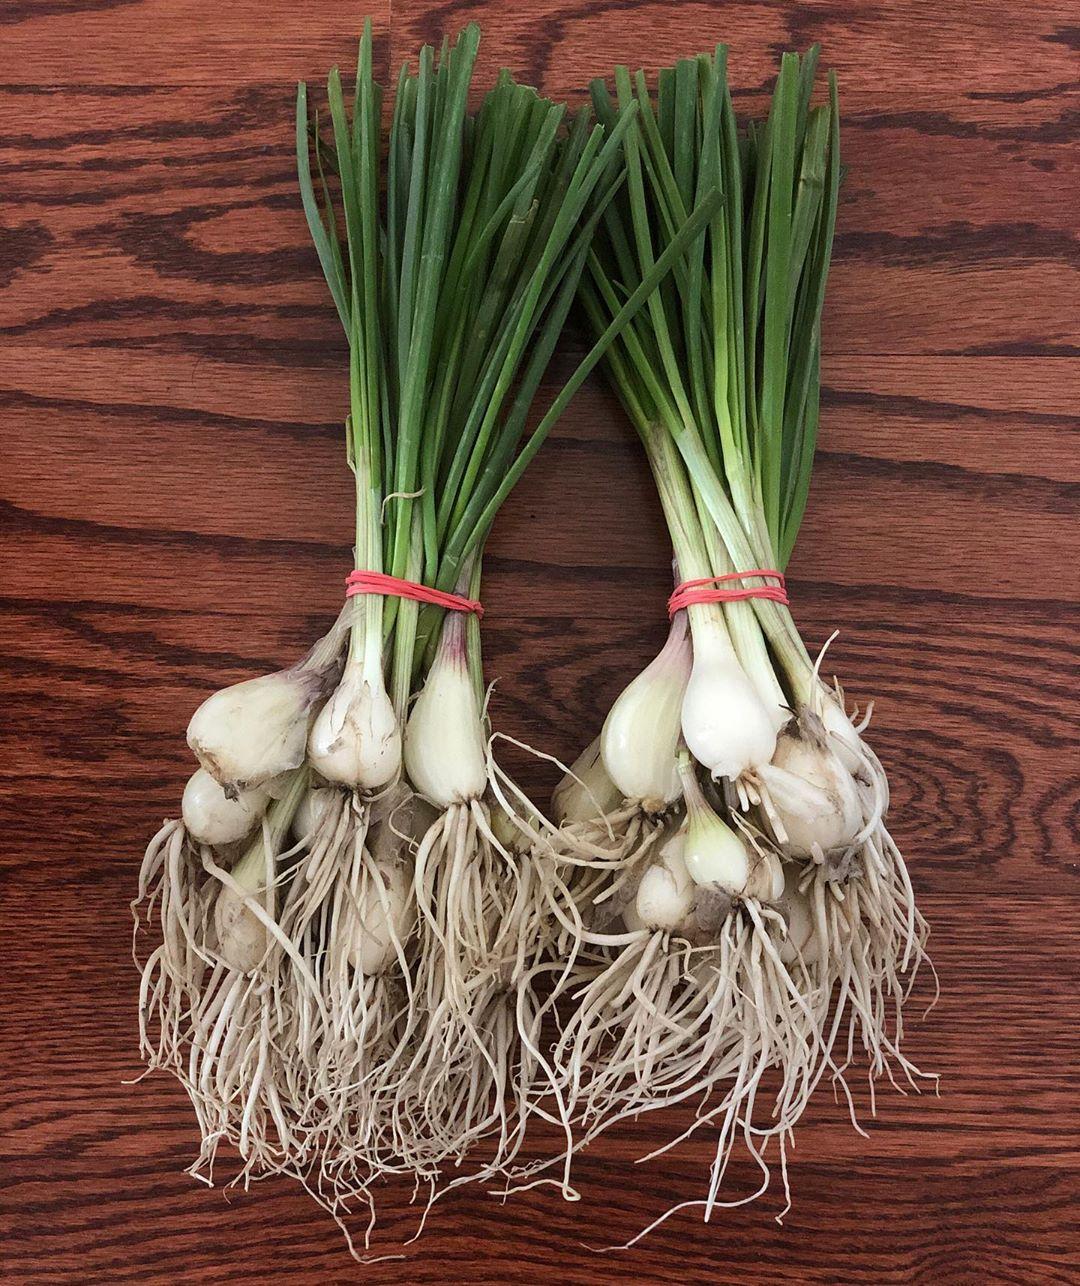 spring onions - longest lasting vegetables